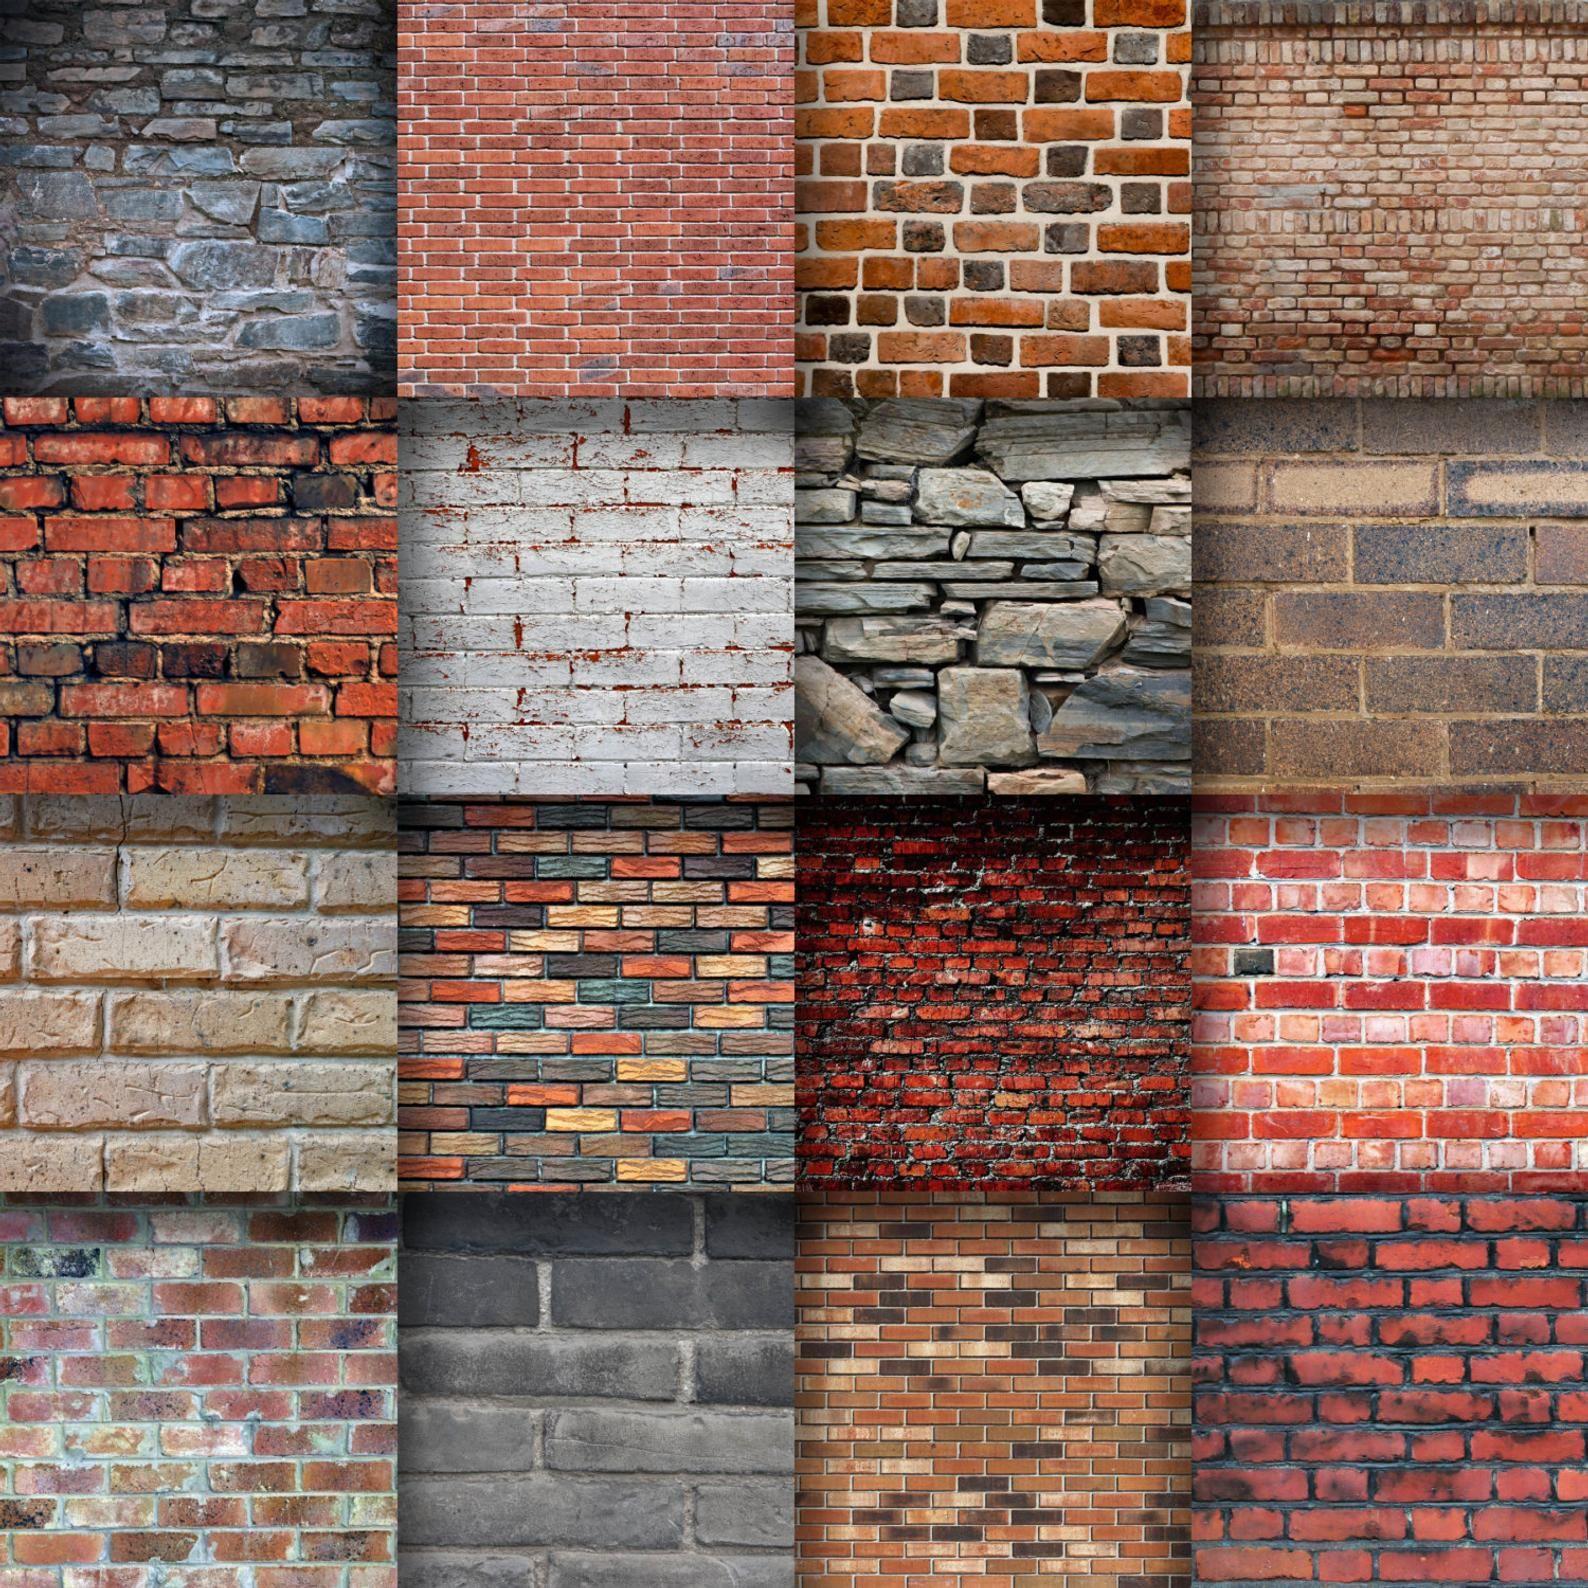 Brick Walls Digital Paper Brick Textures 16 Designs 12in X 12in Commercial Use Instant Download Brick Interior Wall Brick Exterior House Painted Brick Walls